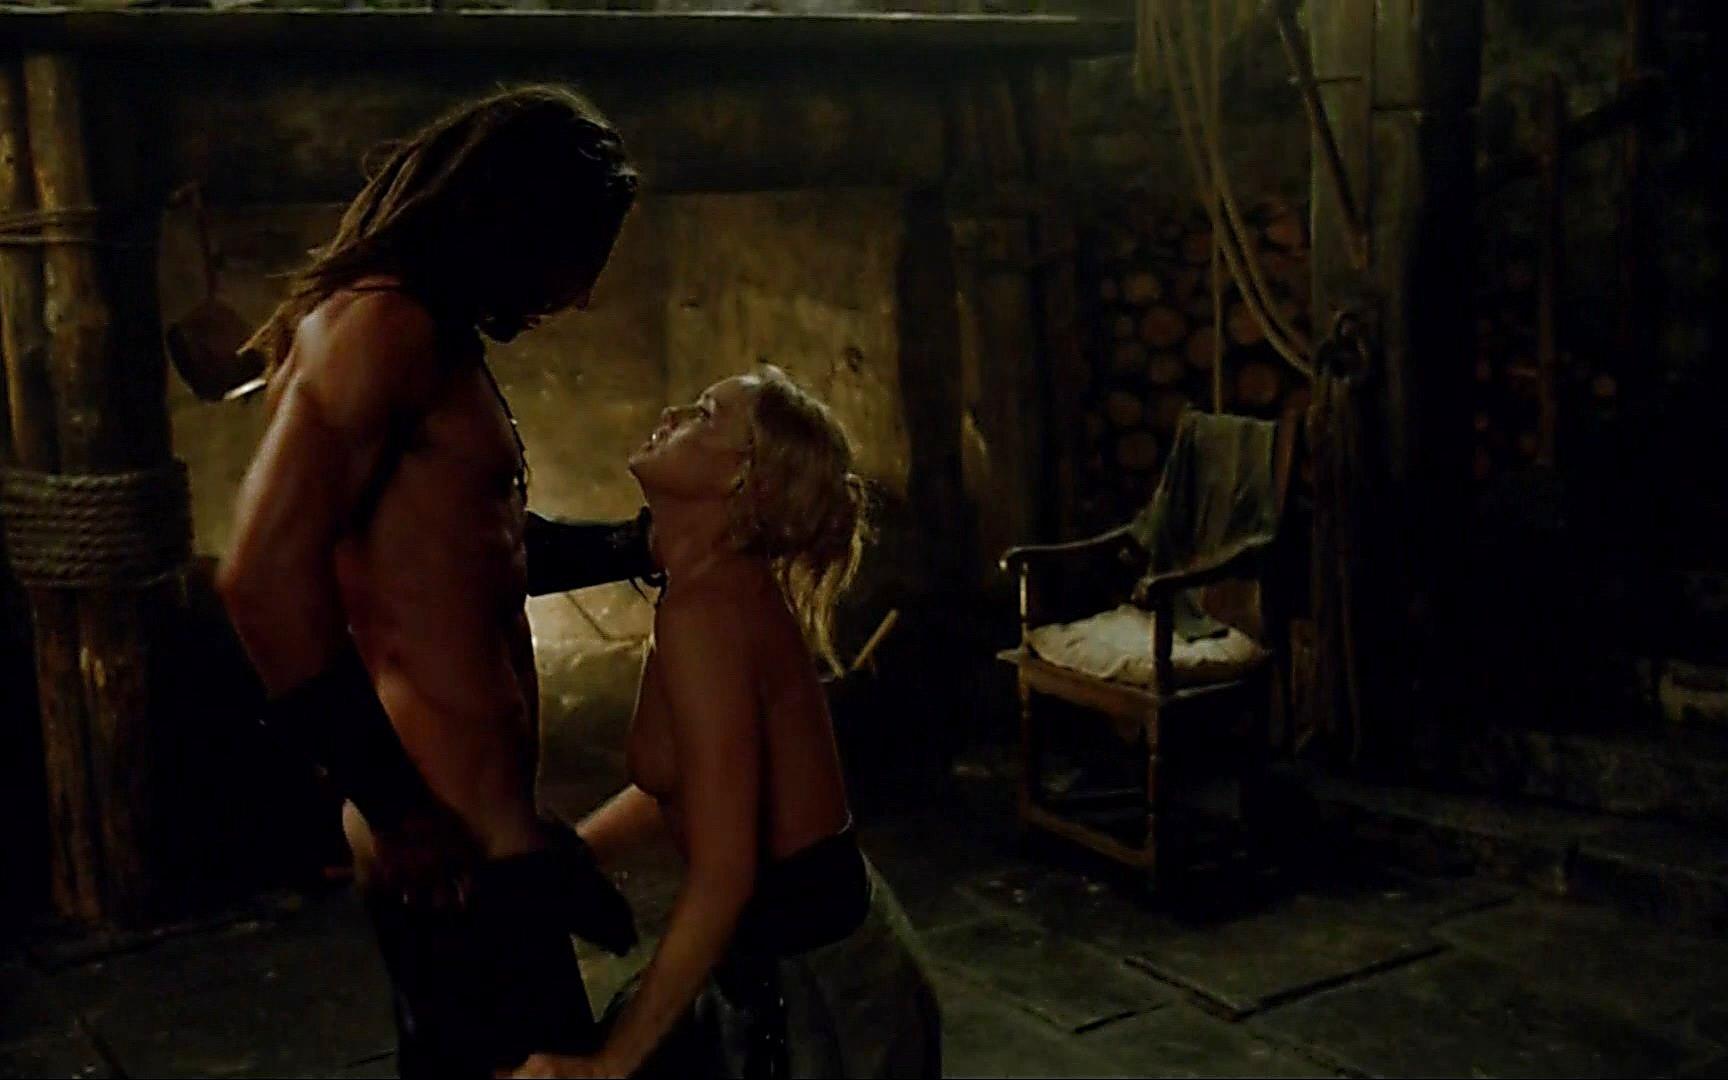 Toby Schmitz sexy shirtless scene February 22, 2015, 8pm